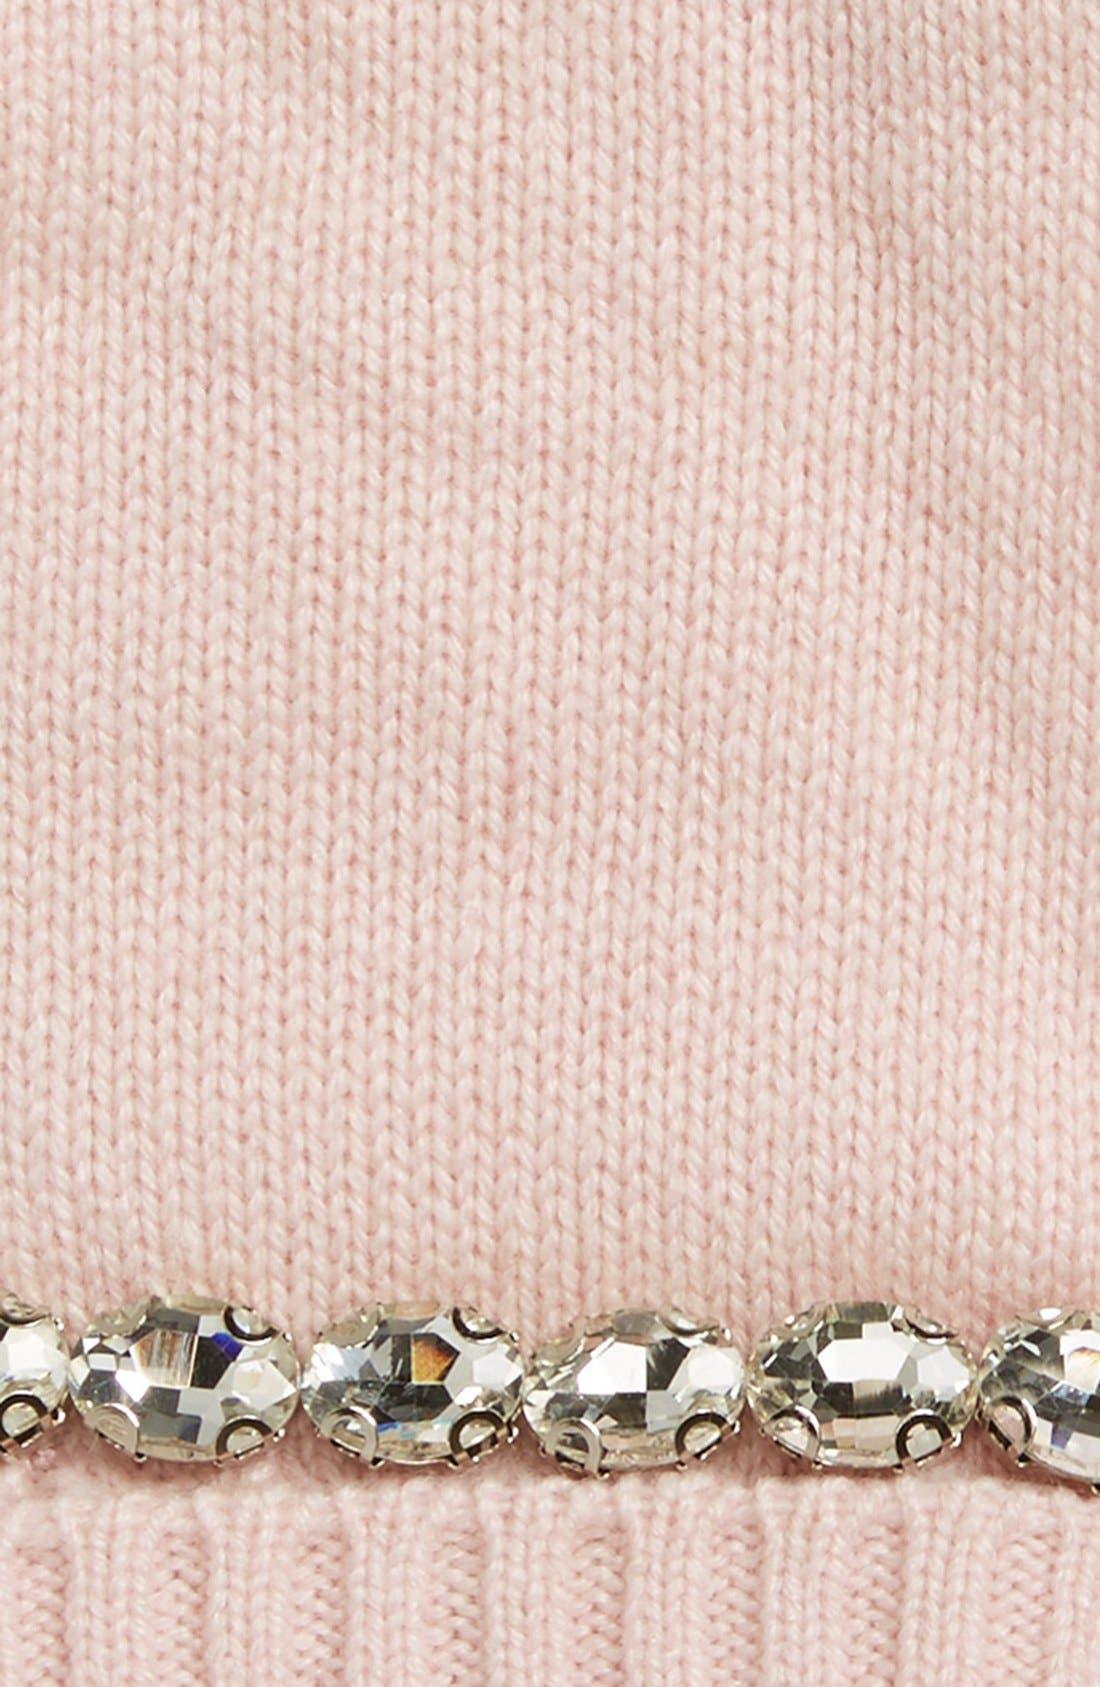 KATE SPADE NEW YORK,                             'pretty lady' gloves,                             Alternate thumbnail 2, color,                             650